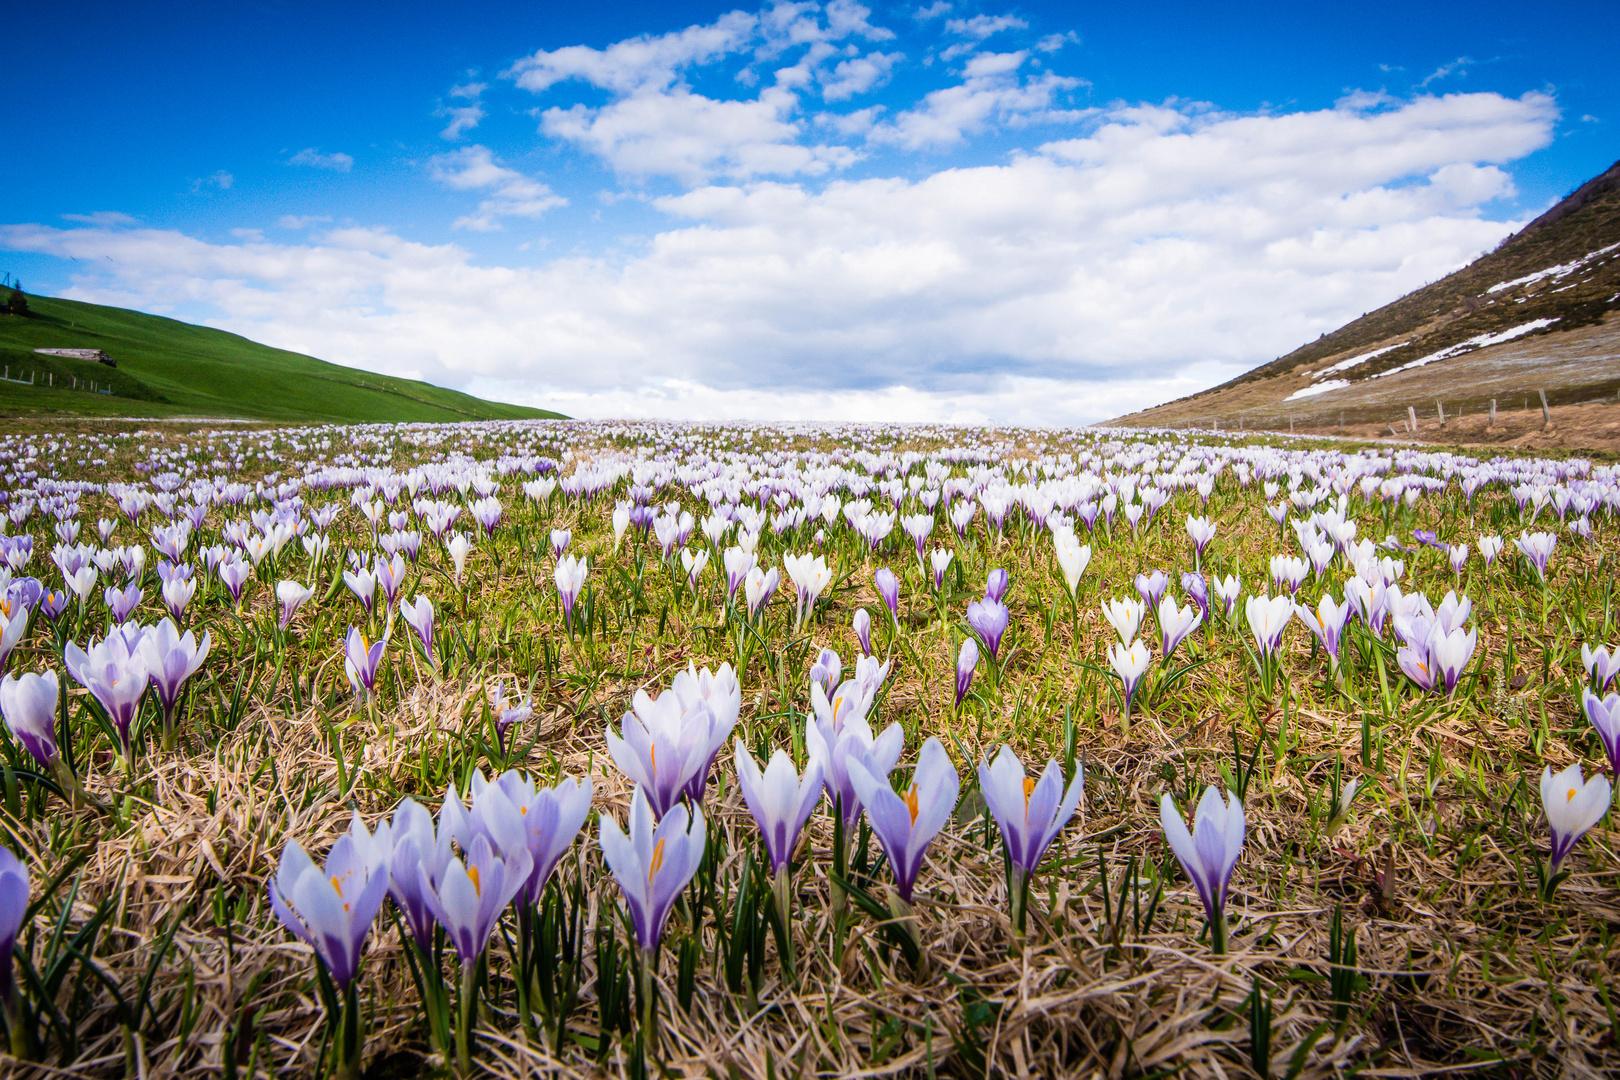 Frühling auf 1800 Meter